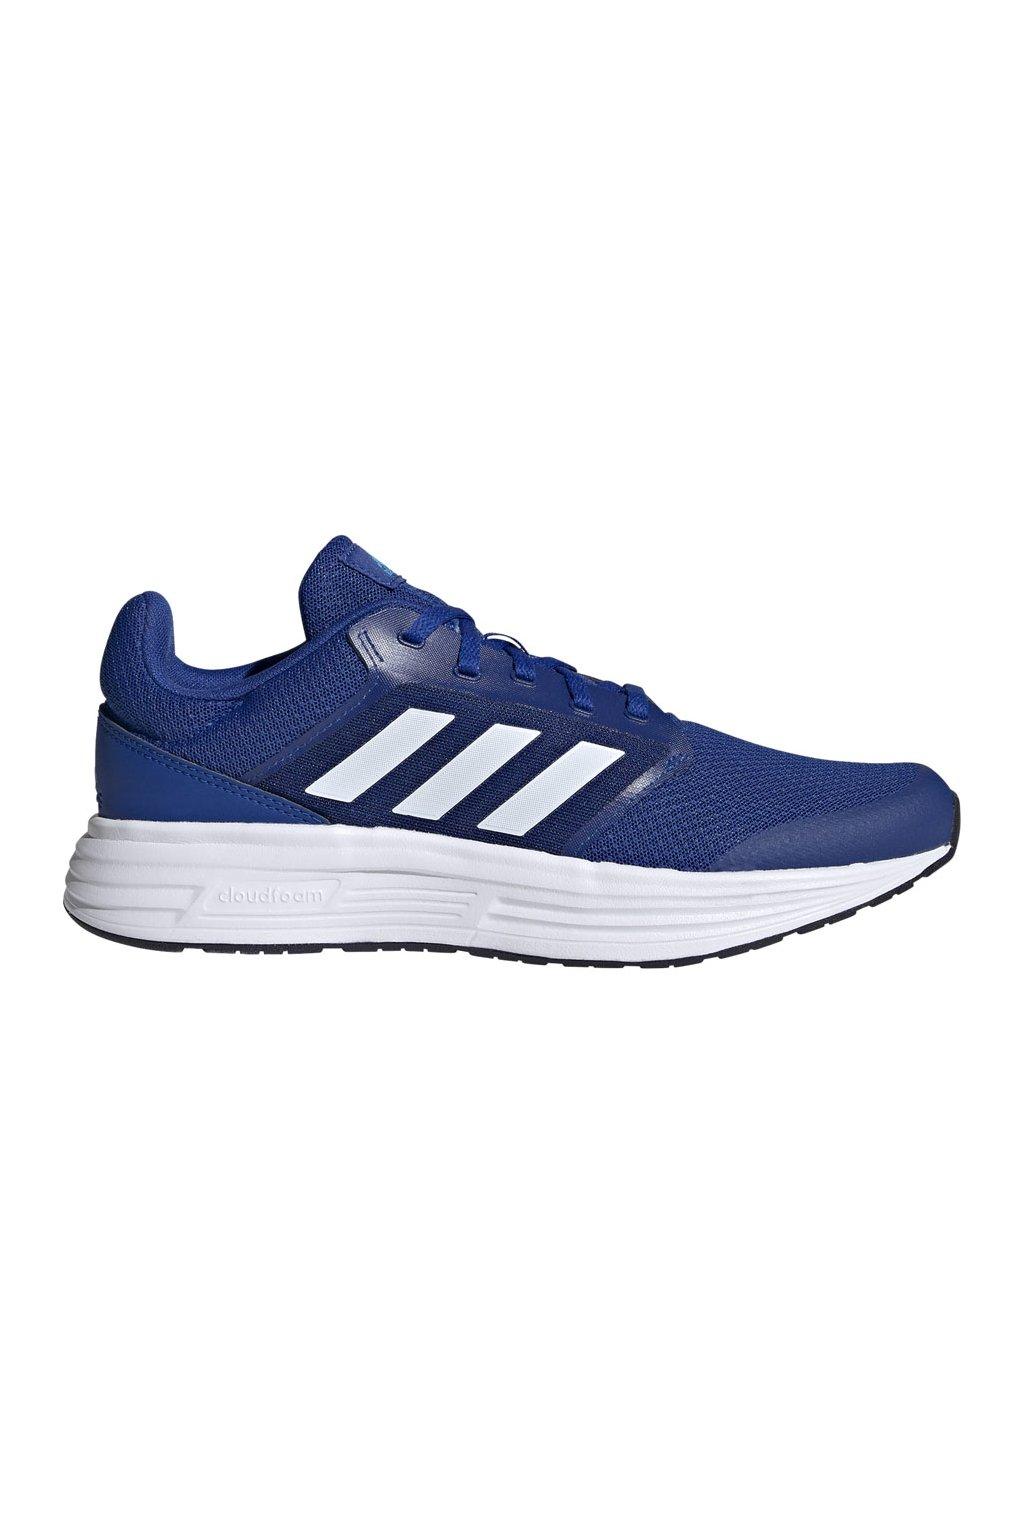 Pánske tenisky adidas Galaxy 5 modré FY6736